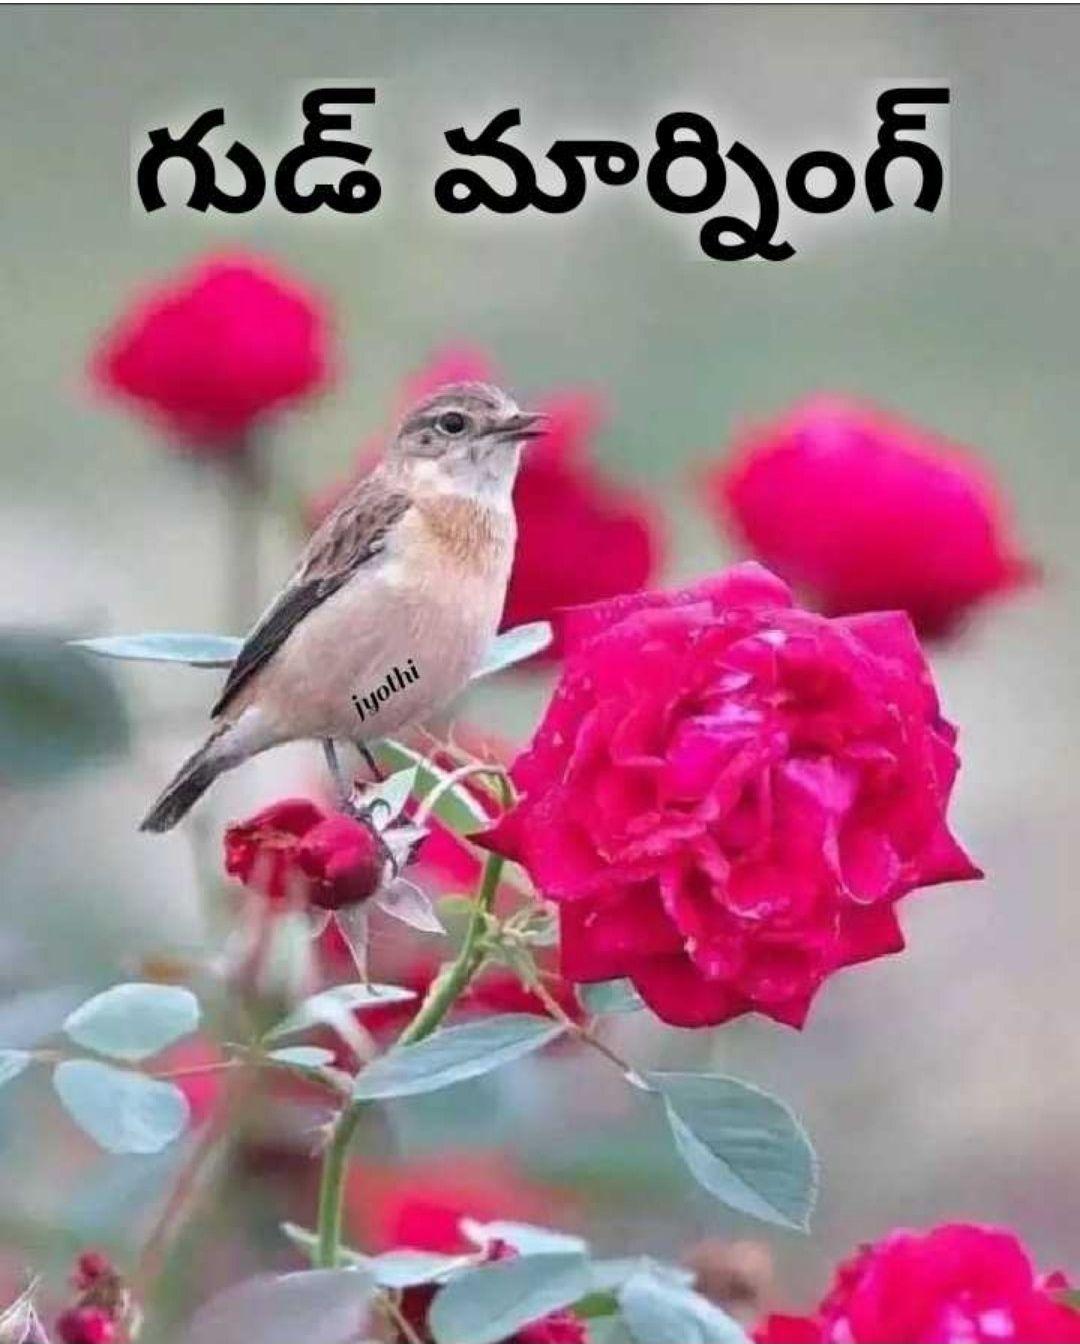 goodmorning - గుడ్ మార్నింగ్ jyothi - ShareChat